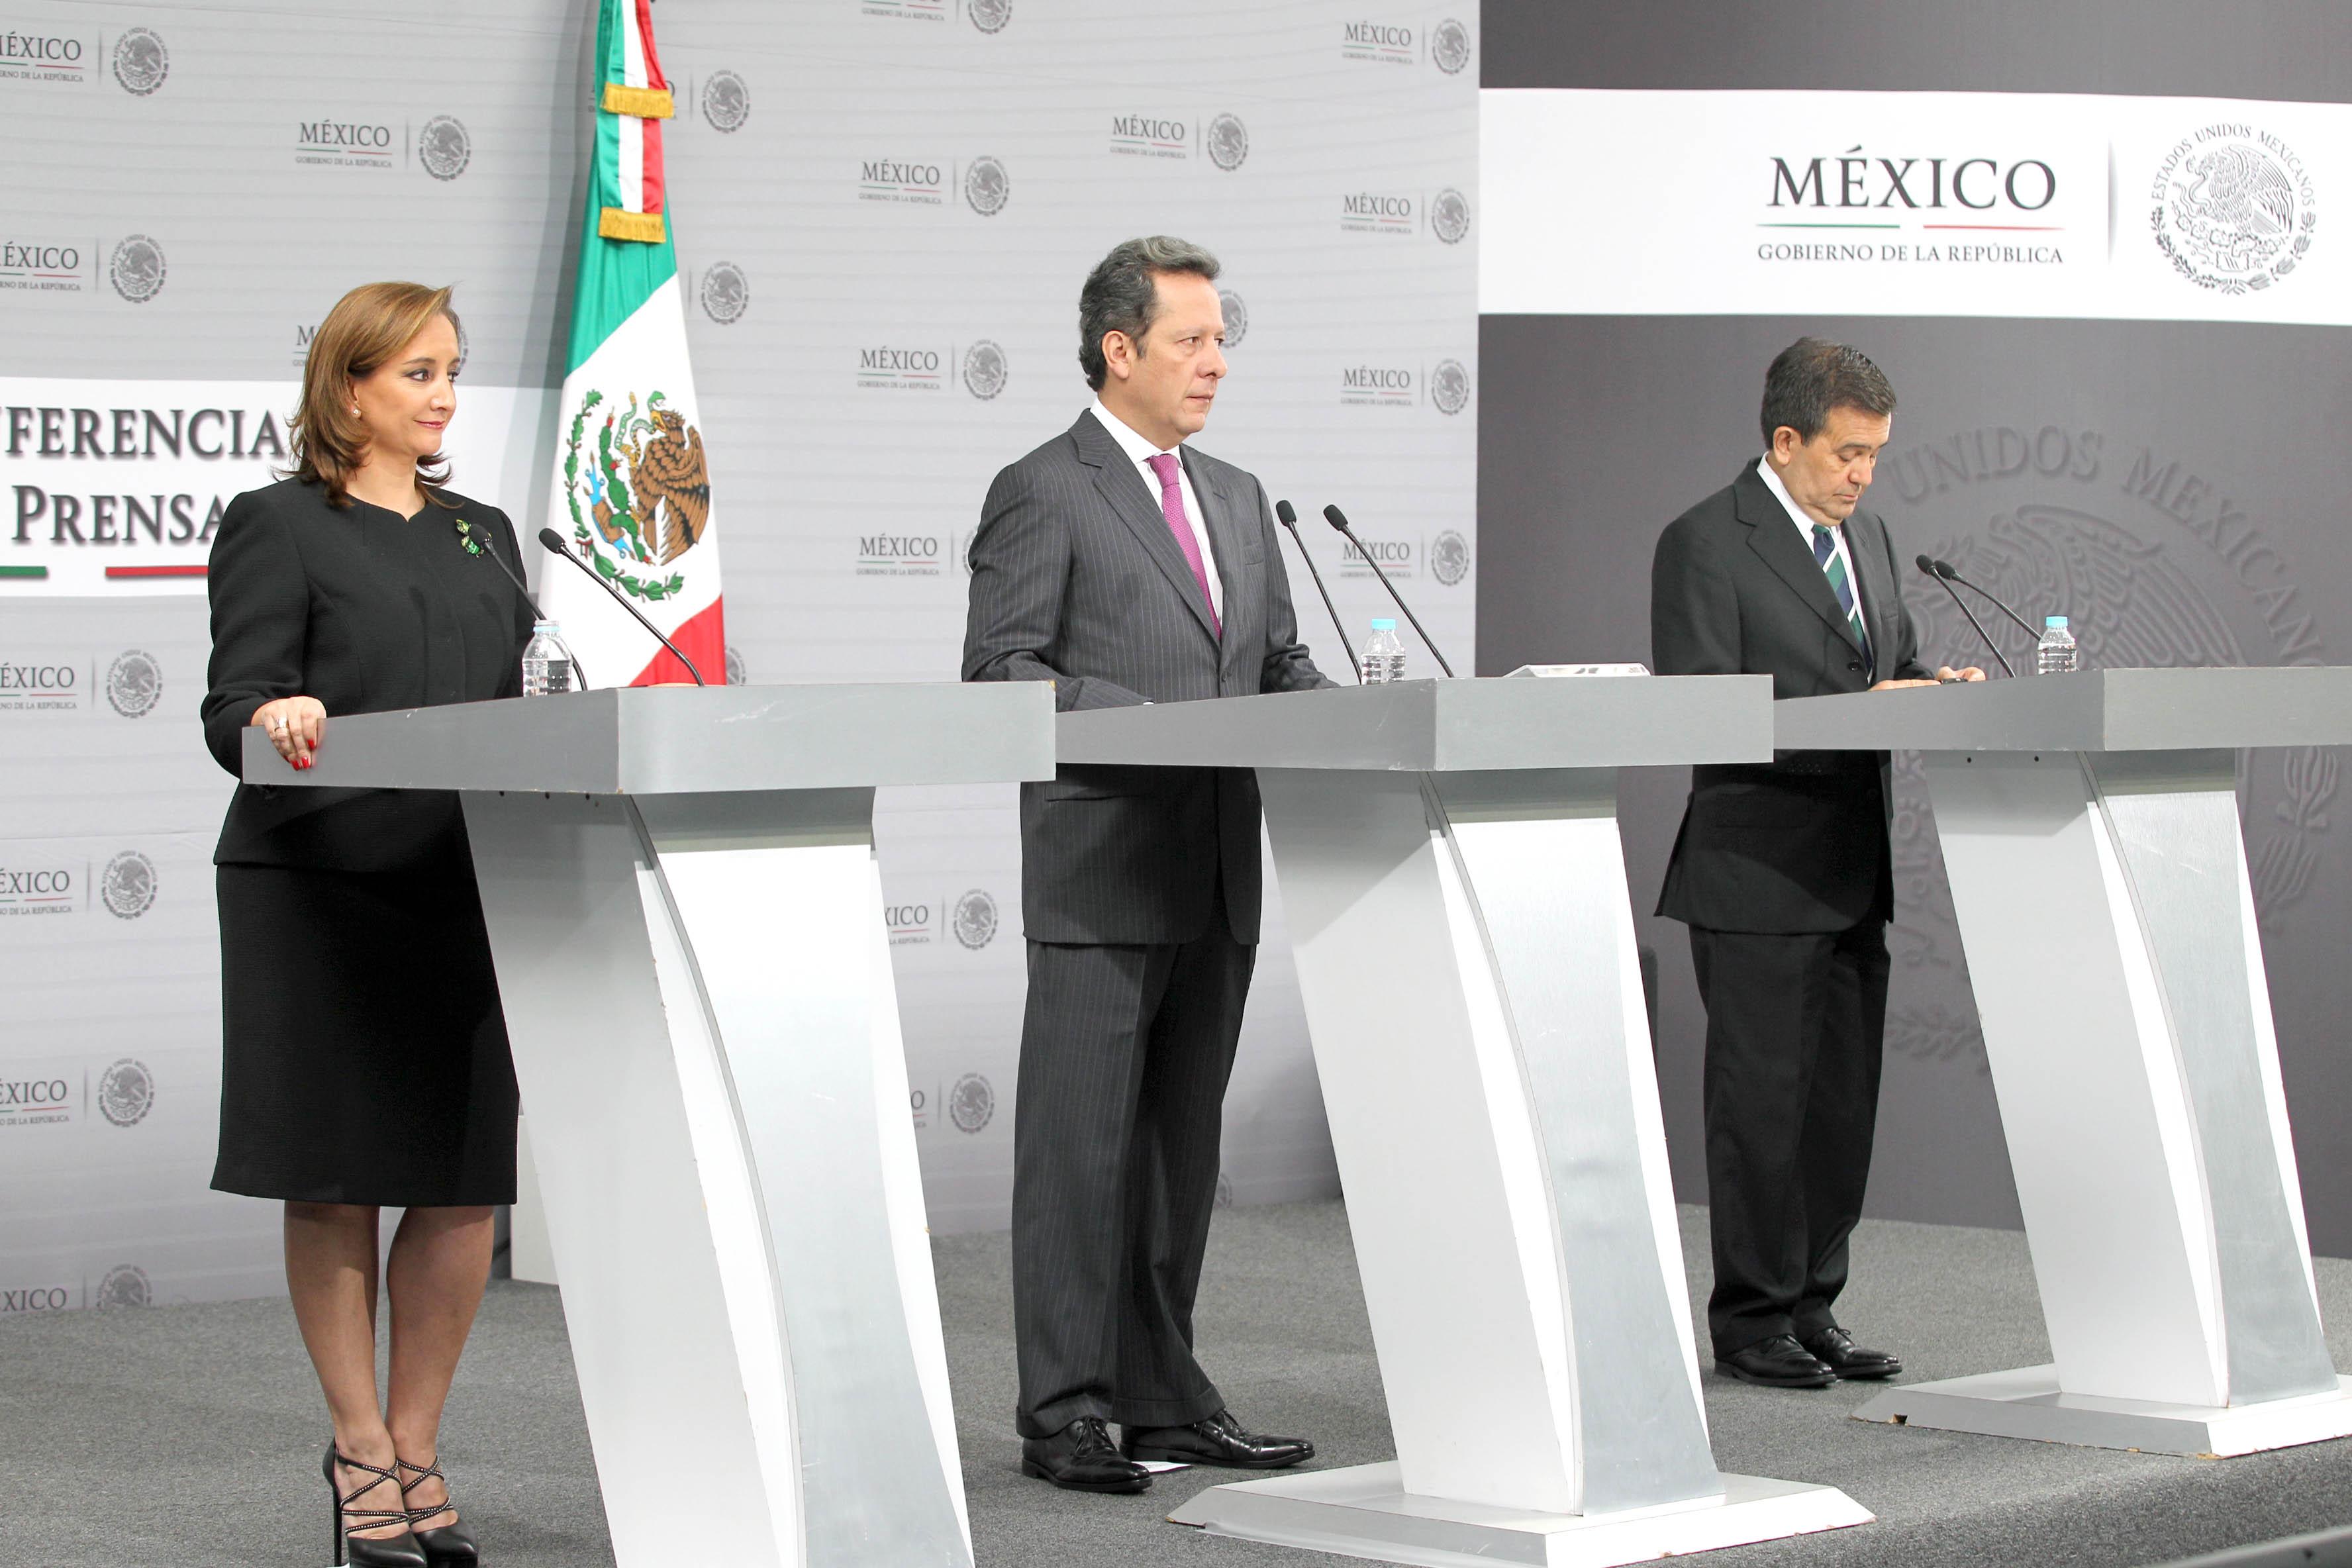 FOTO 2 Conferencia de prensa de la Canciller Claudia Ruiz Massieu  Eduardo S nchez e Ildefonso Guajardo.jpg